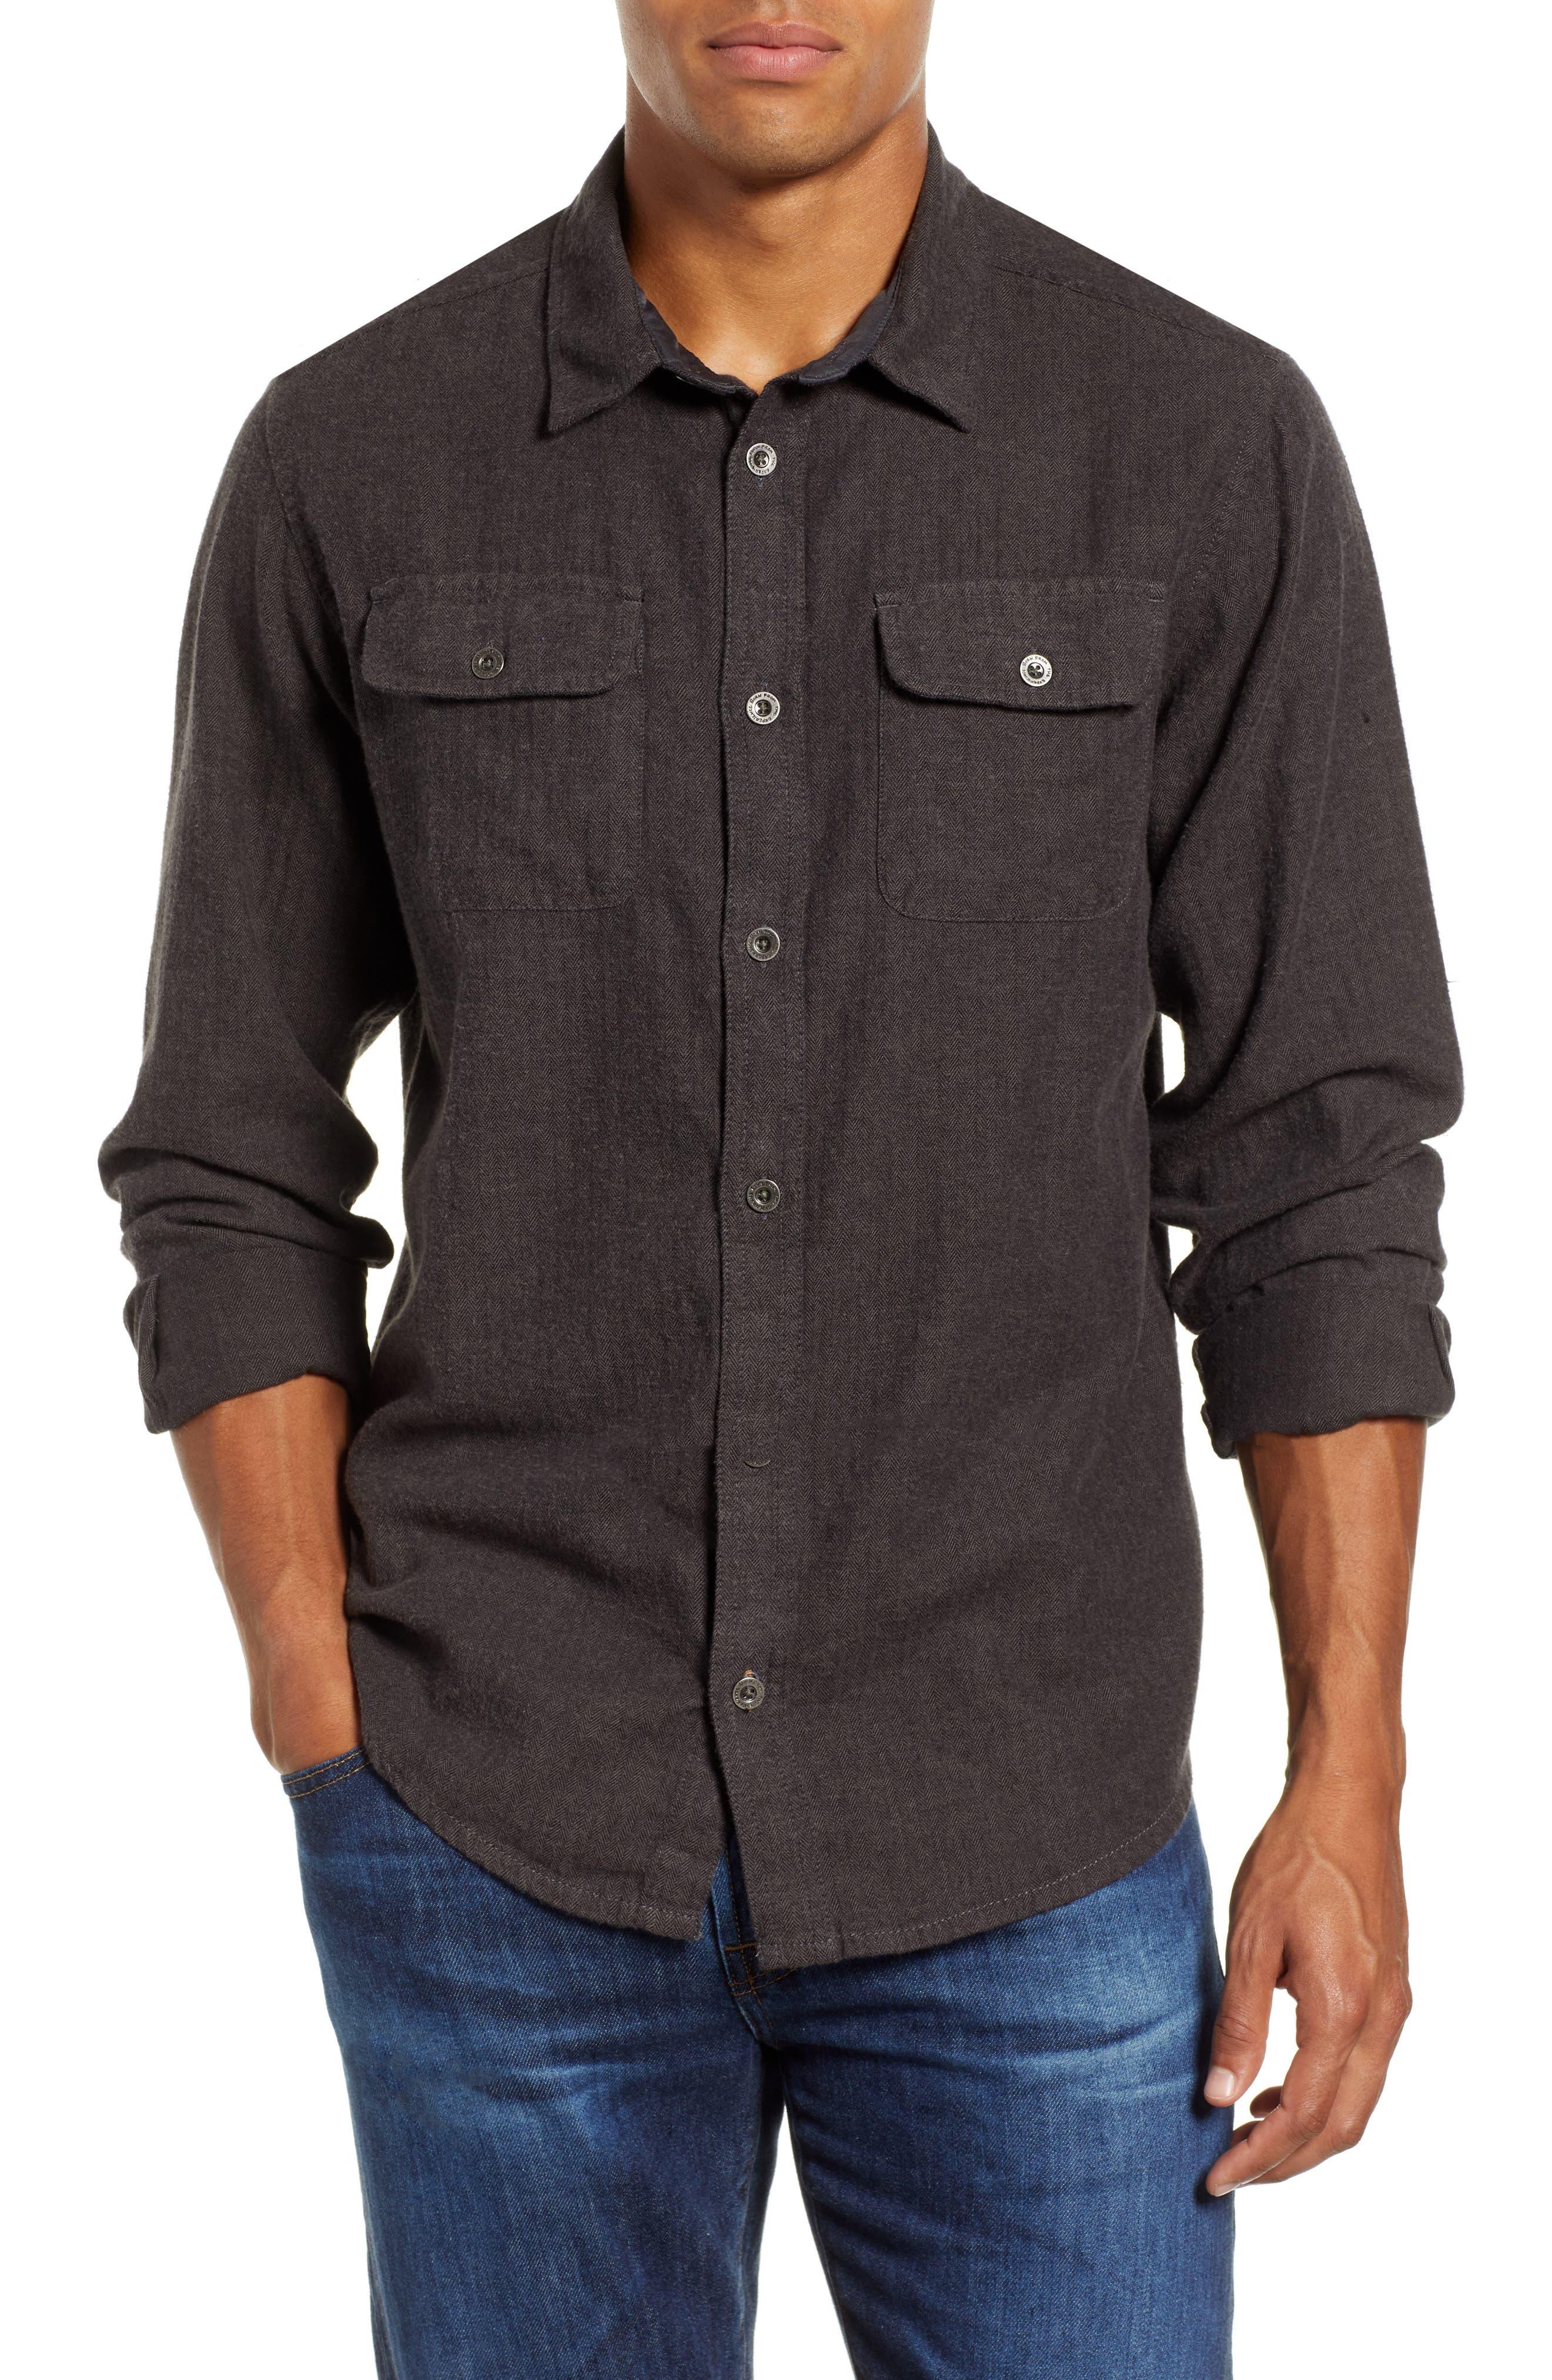 Lybek Regular Fit Herringbone Flannel Shirt,                         Main,                         color, SCORCHED BROWN HERRINGBONE